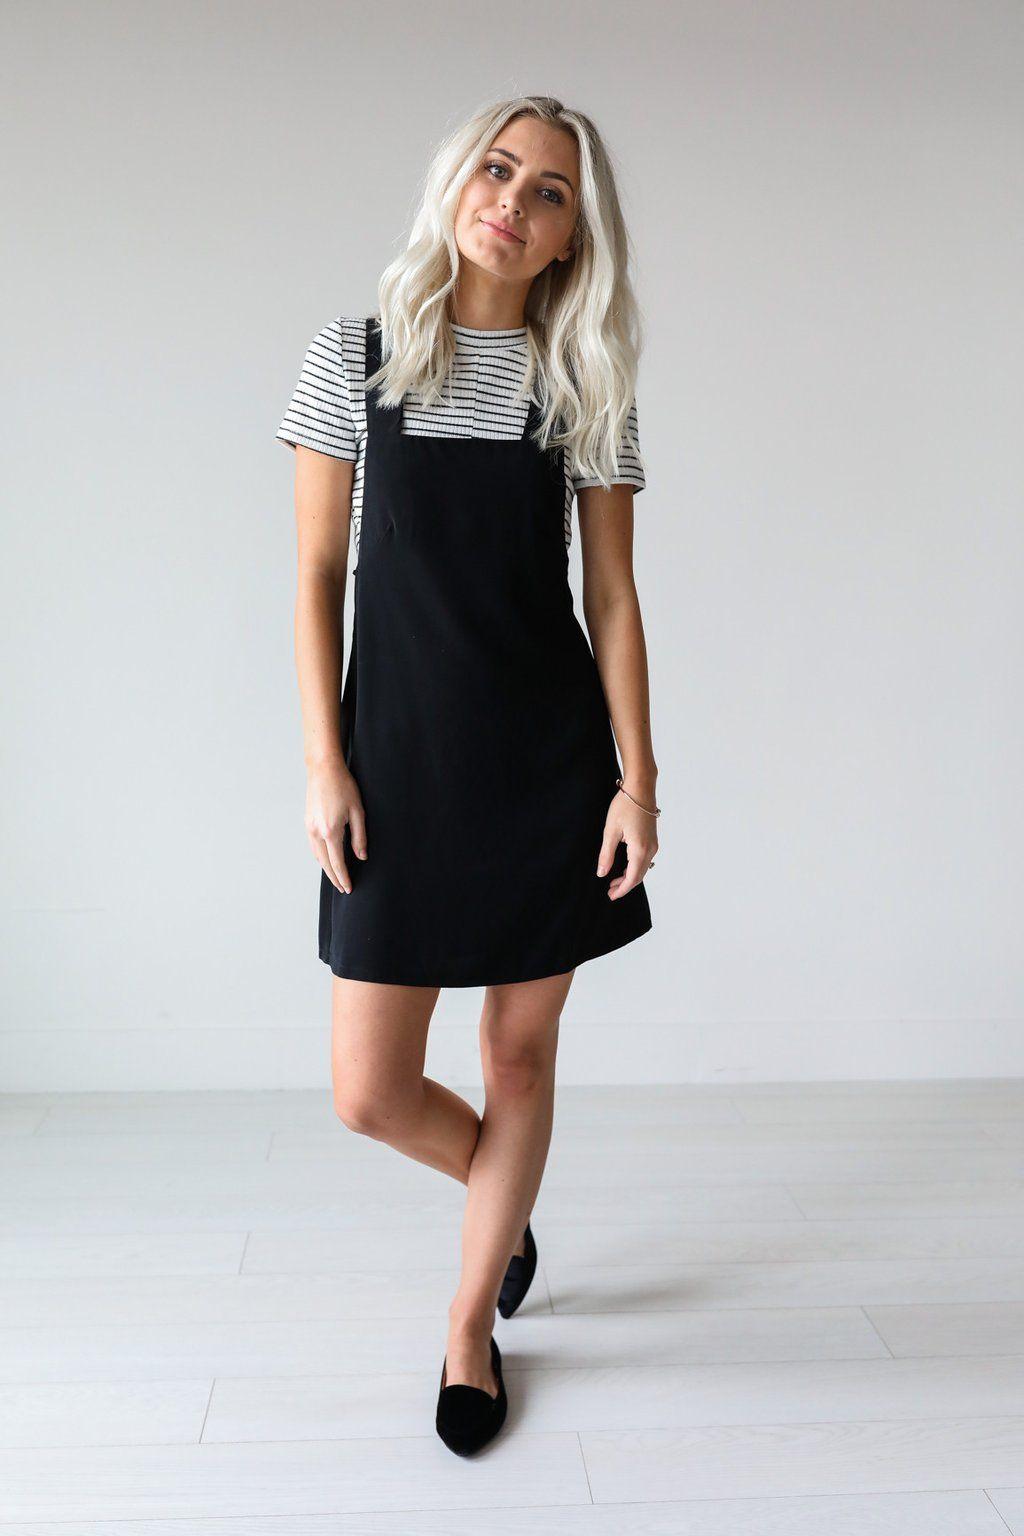 Trendy black overall dress